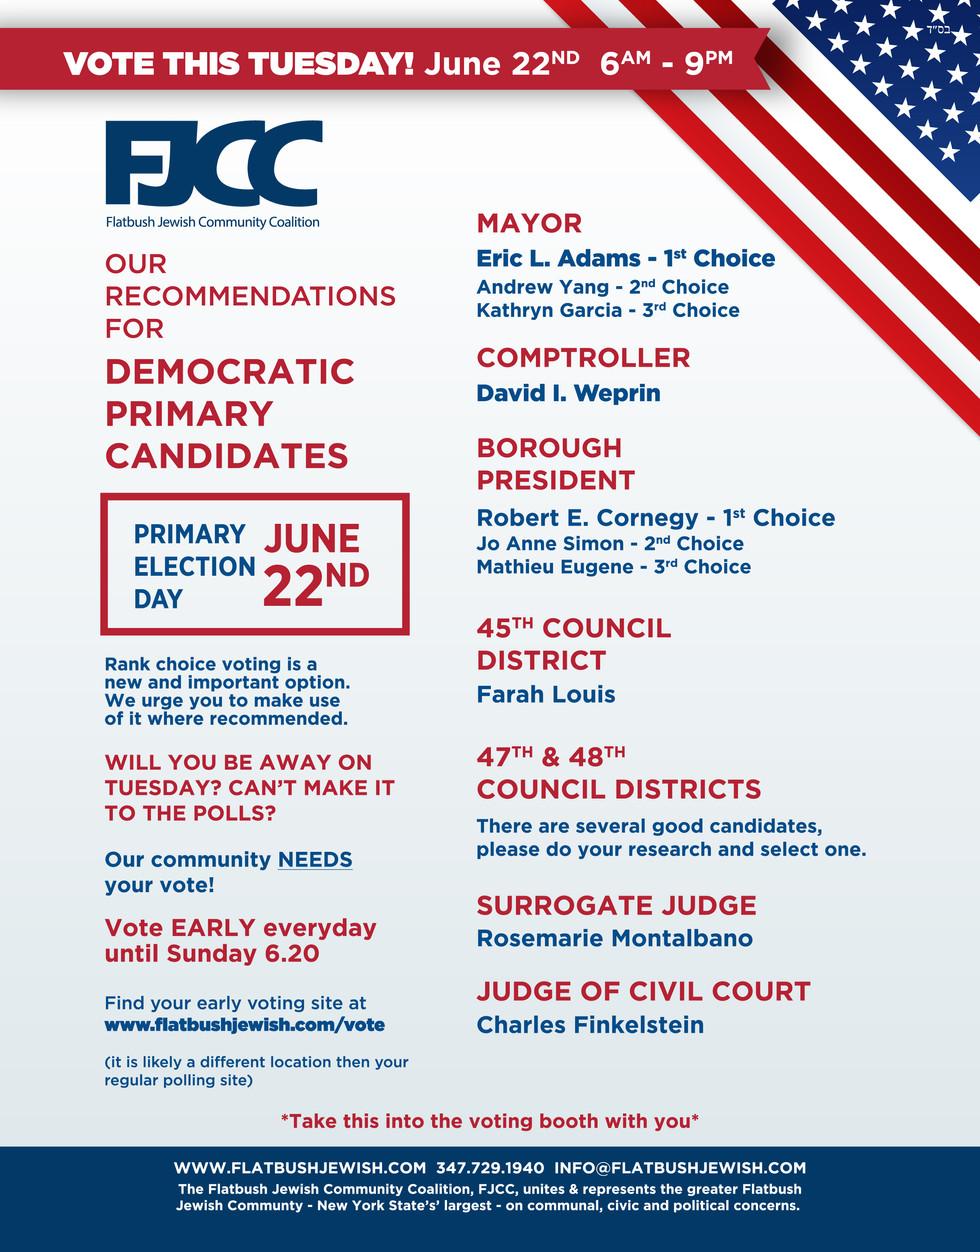 FJCC Voter Recommendations